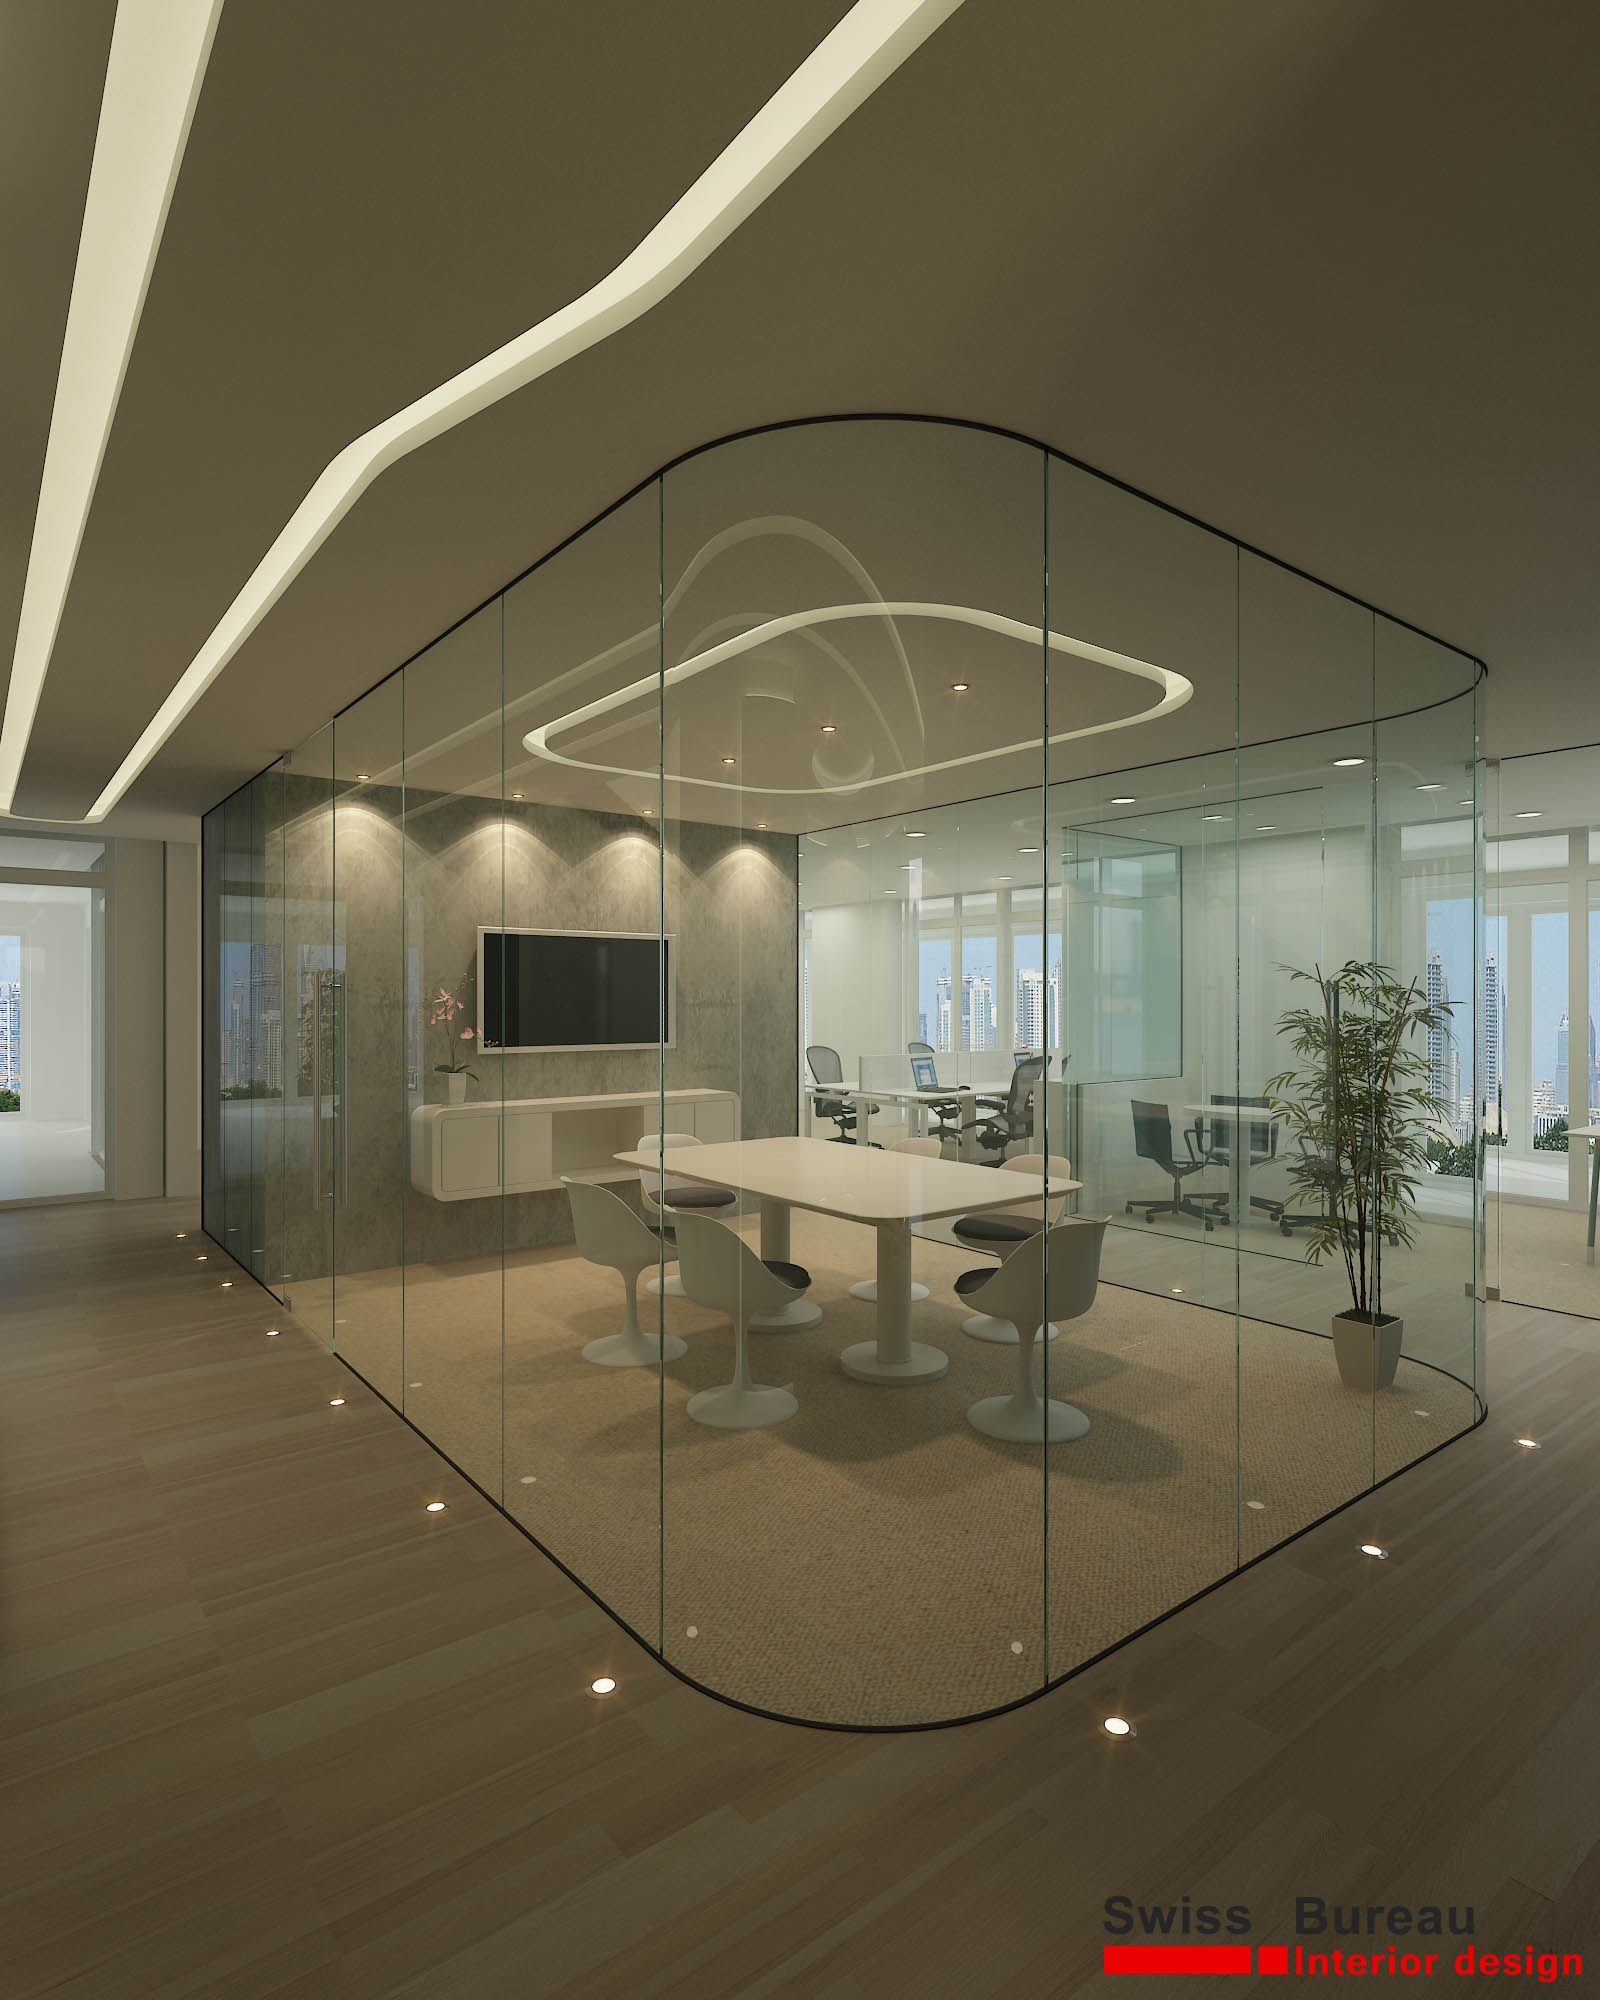 Swiss Bureau Interior Design Company Dubai Uae: Pin De G&S SERVICIOS INMOBILIARIOS En Oficinas Modernas En